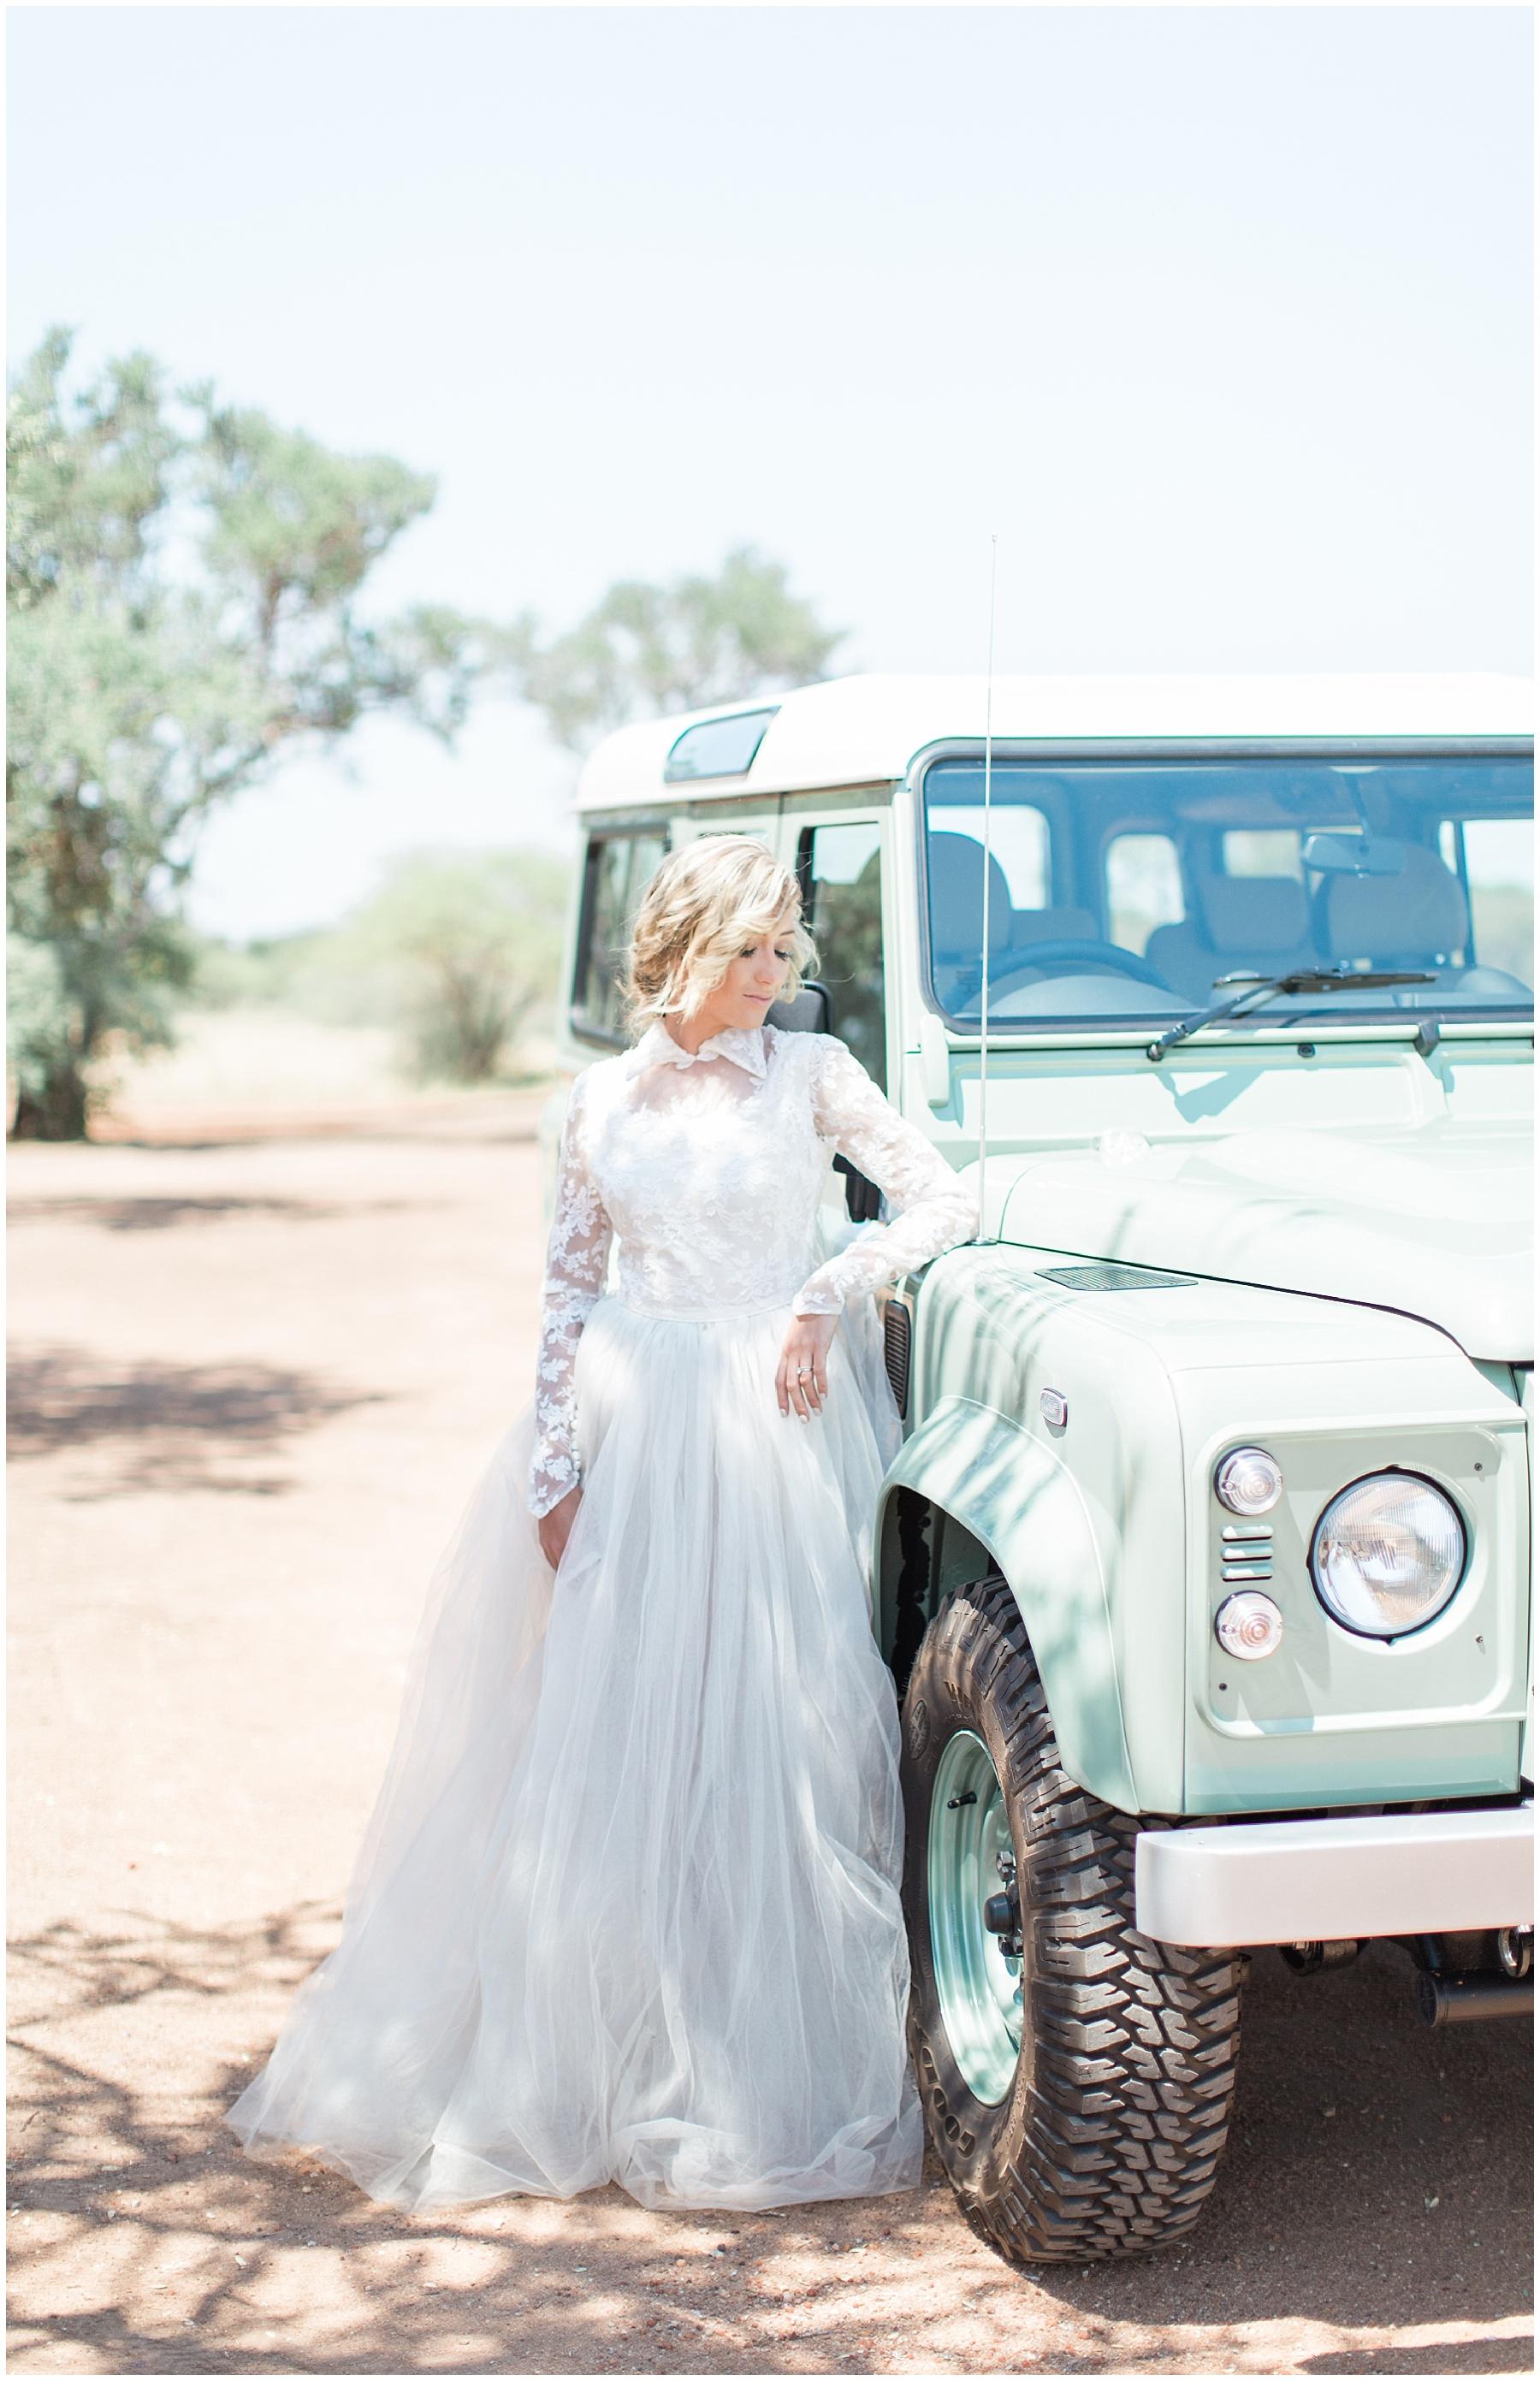 AliciaLandman_JoleneandZander_Wedding_The Pretty Blog_0445.jpg